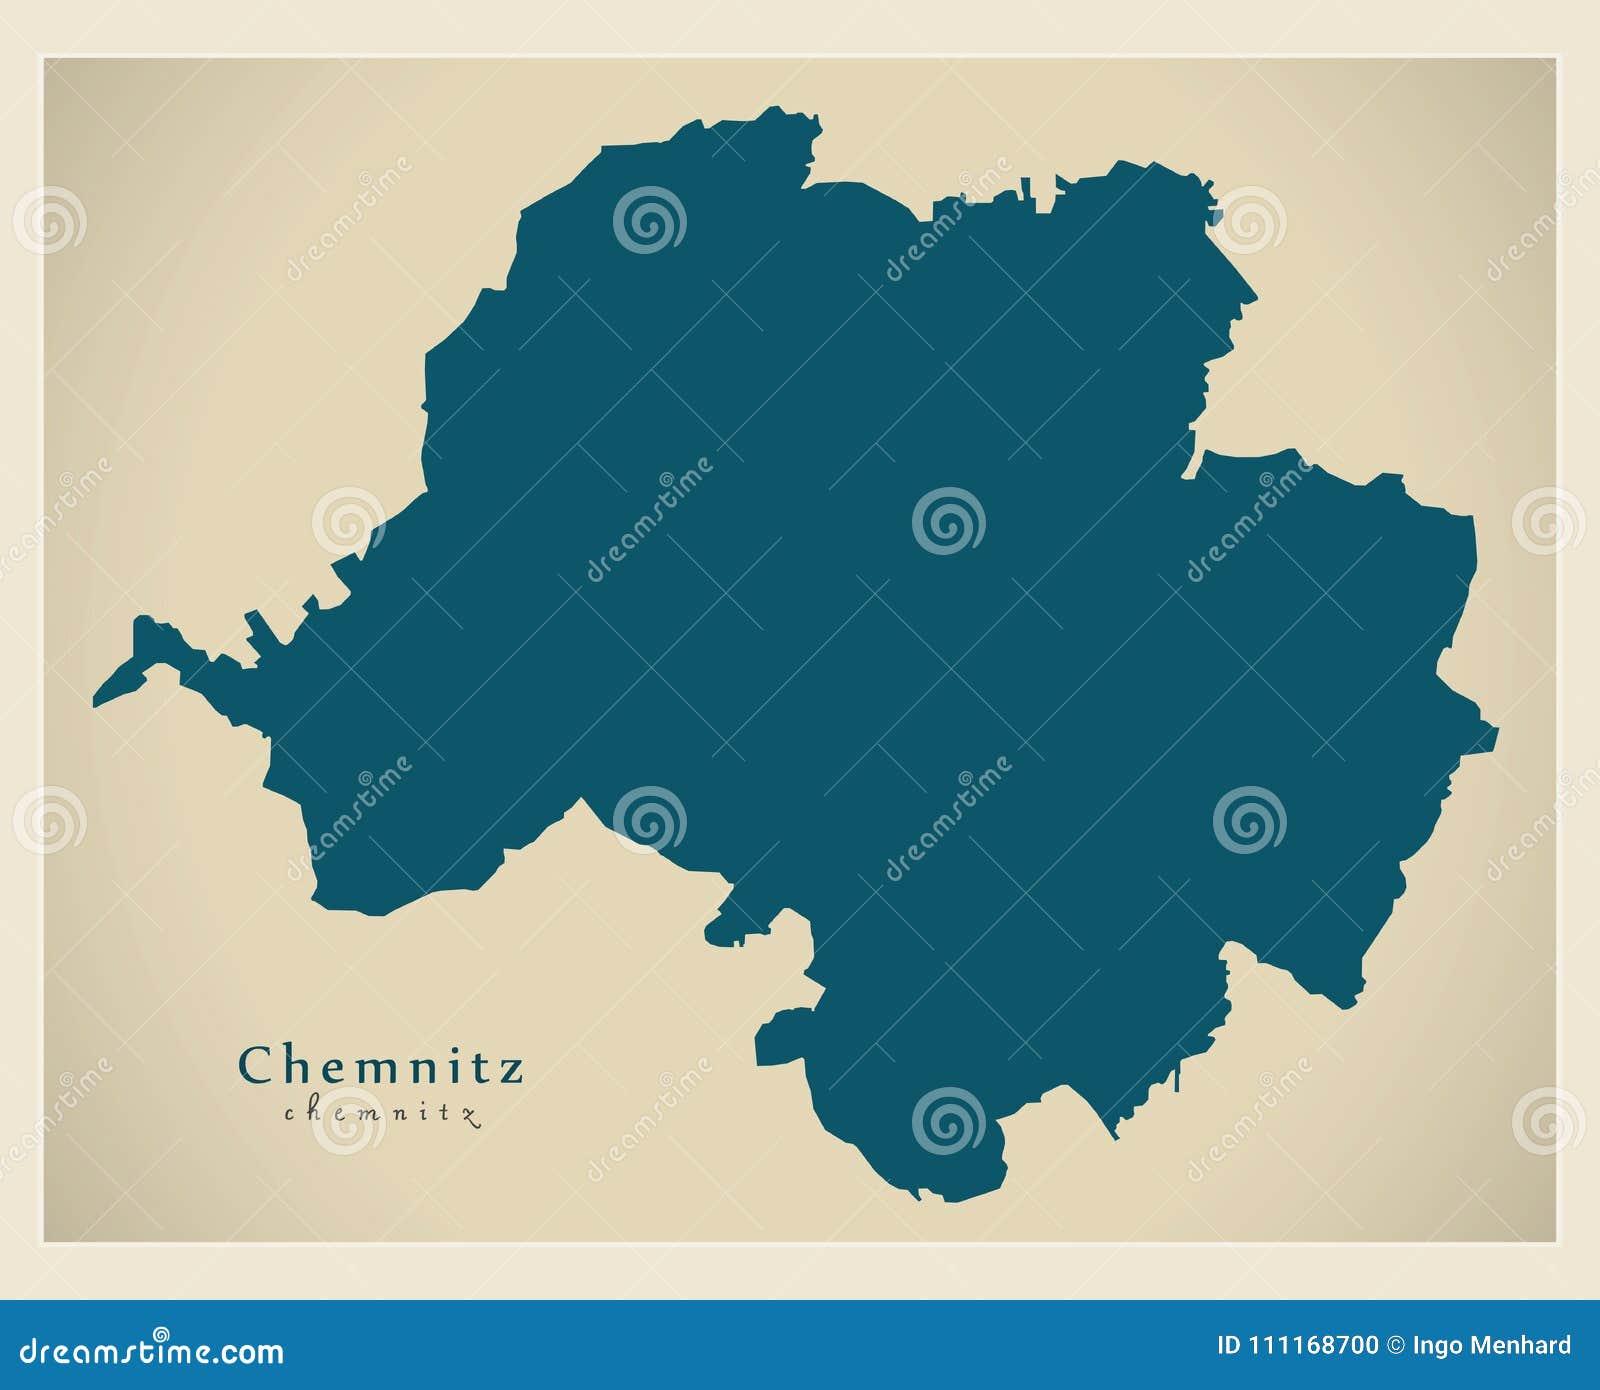 Modern Map   Chemnitz City Of Germany DE Stock Vector